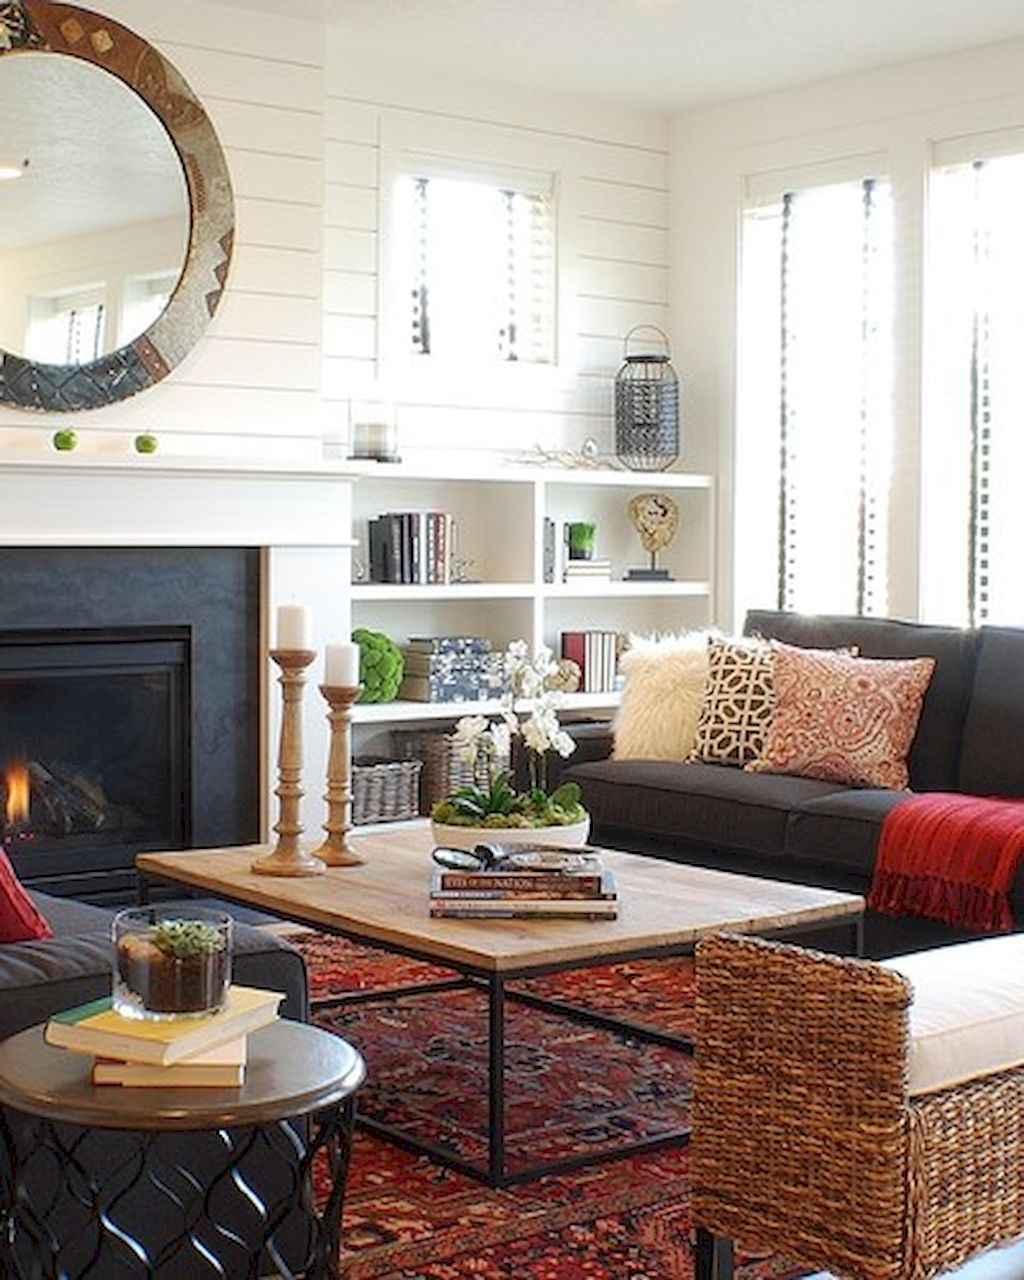 Cool Living Room Decor: 60 Cool Modern Farmhouse Living Room Decor Ideas (42